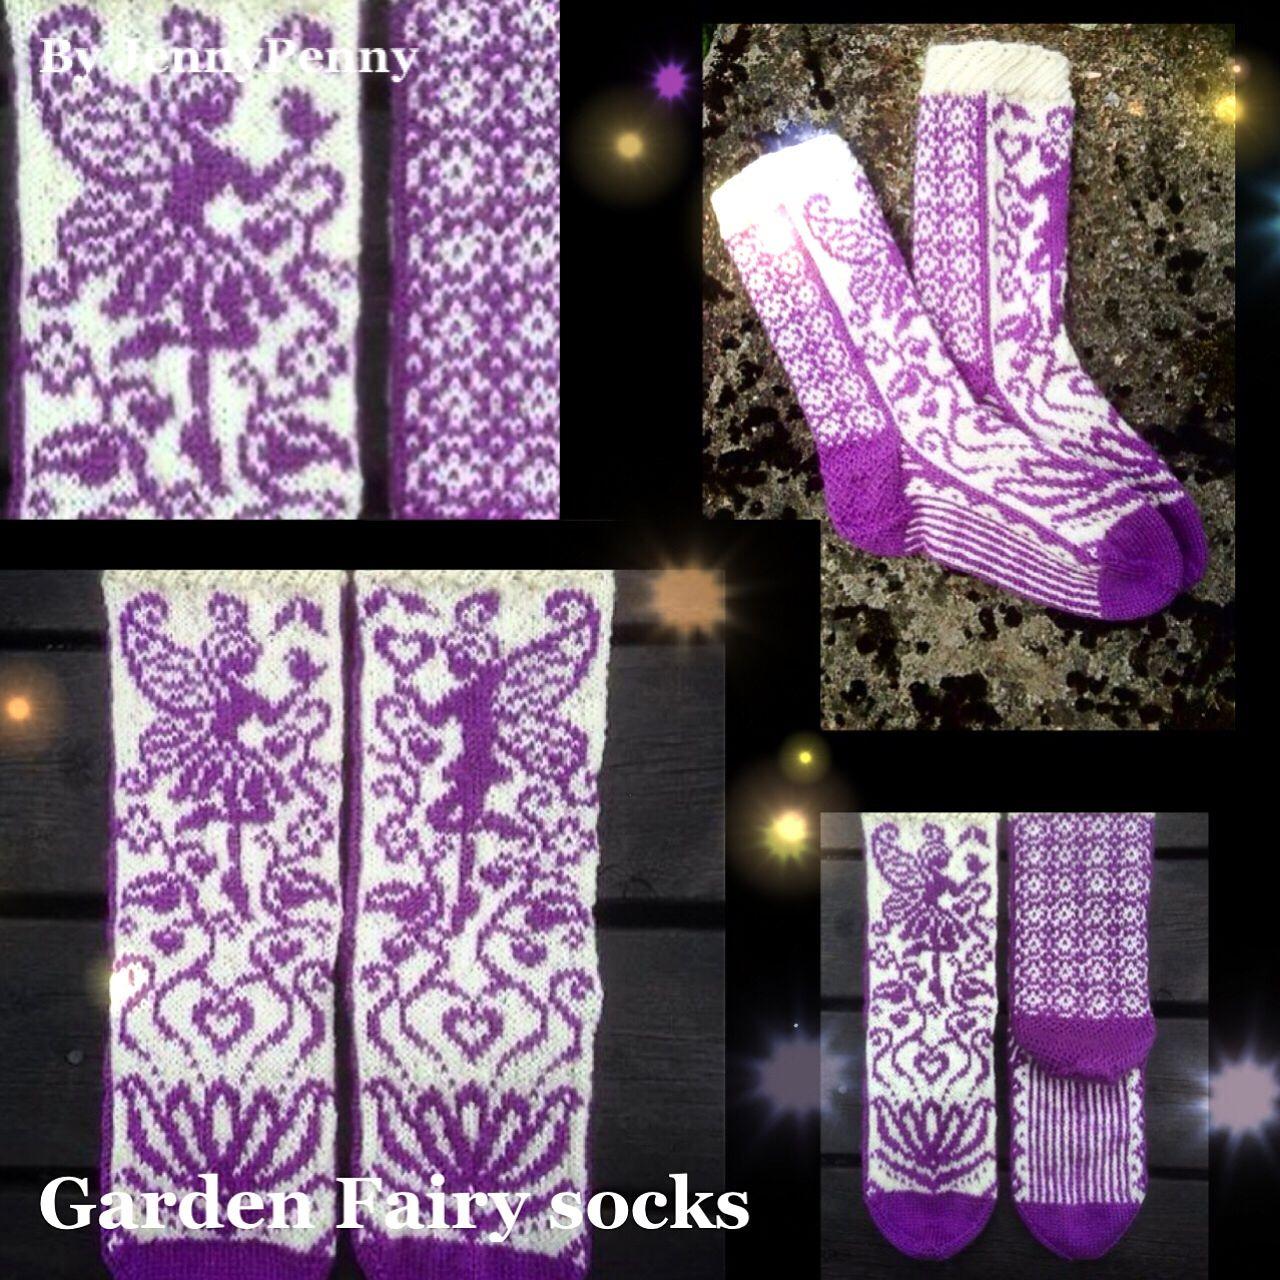 Gorgeous sock patterns from a talented Sweedish designer Ravelry: Garden Fairy socks pattern by JennyPenny